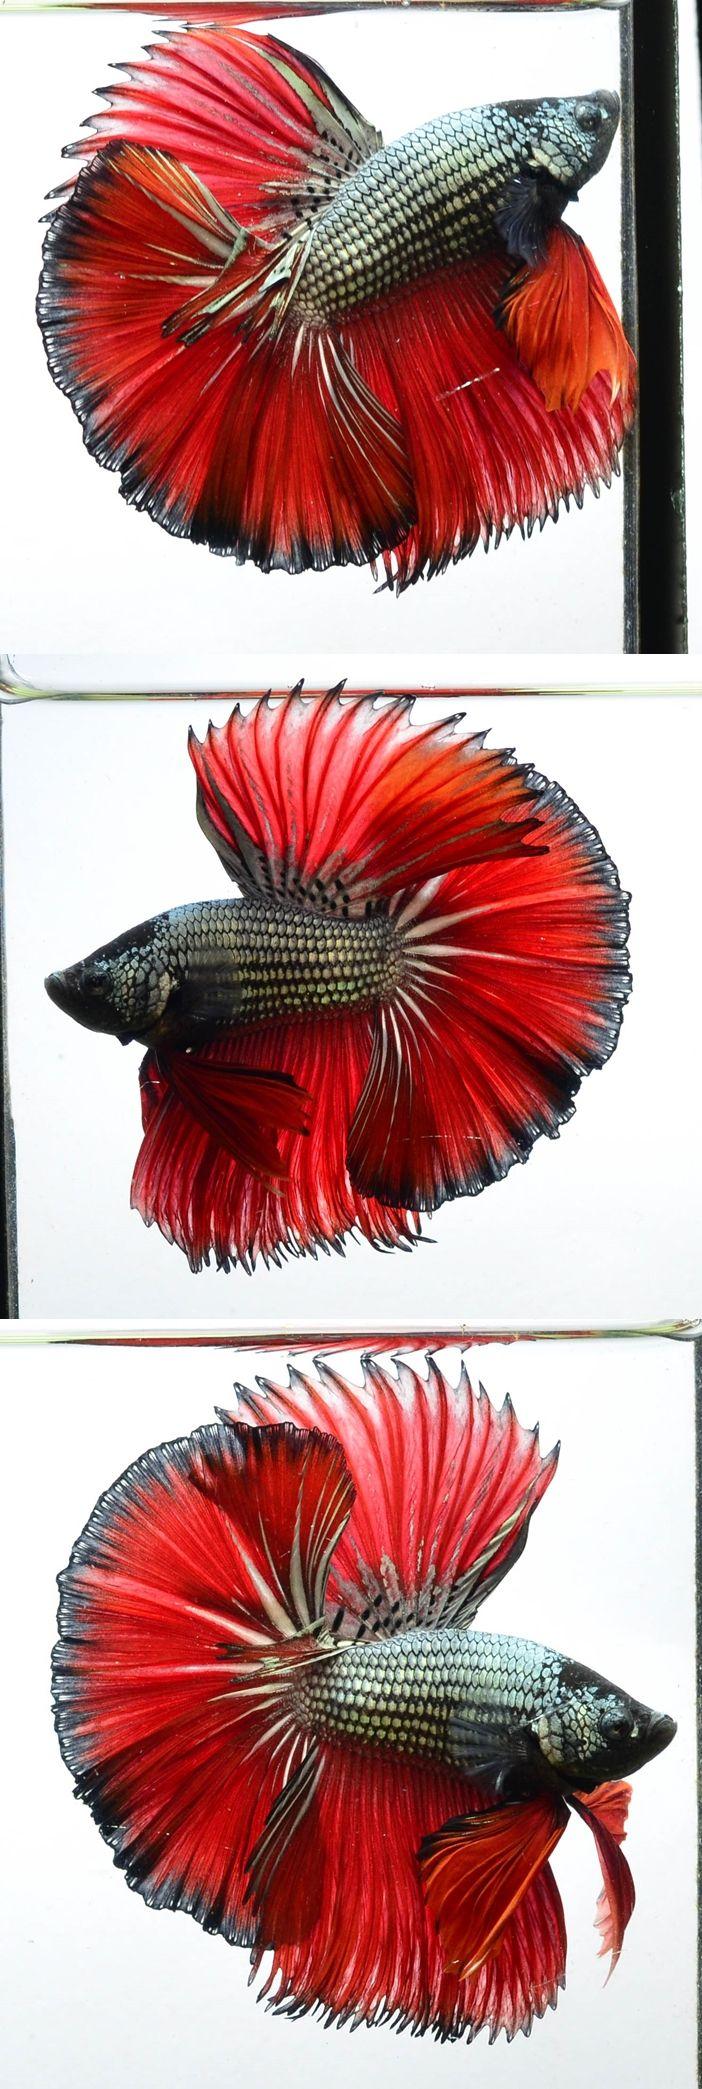 107 best Fighting fish images on Pinterest | Fish tanks, Aquariums ...